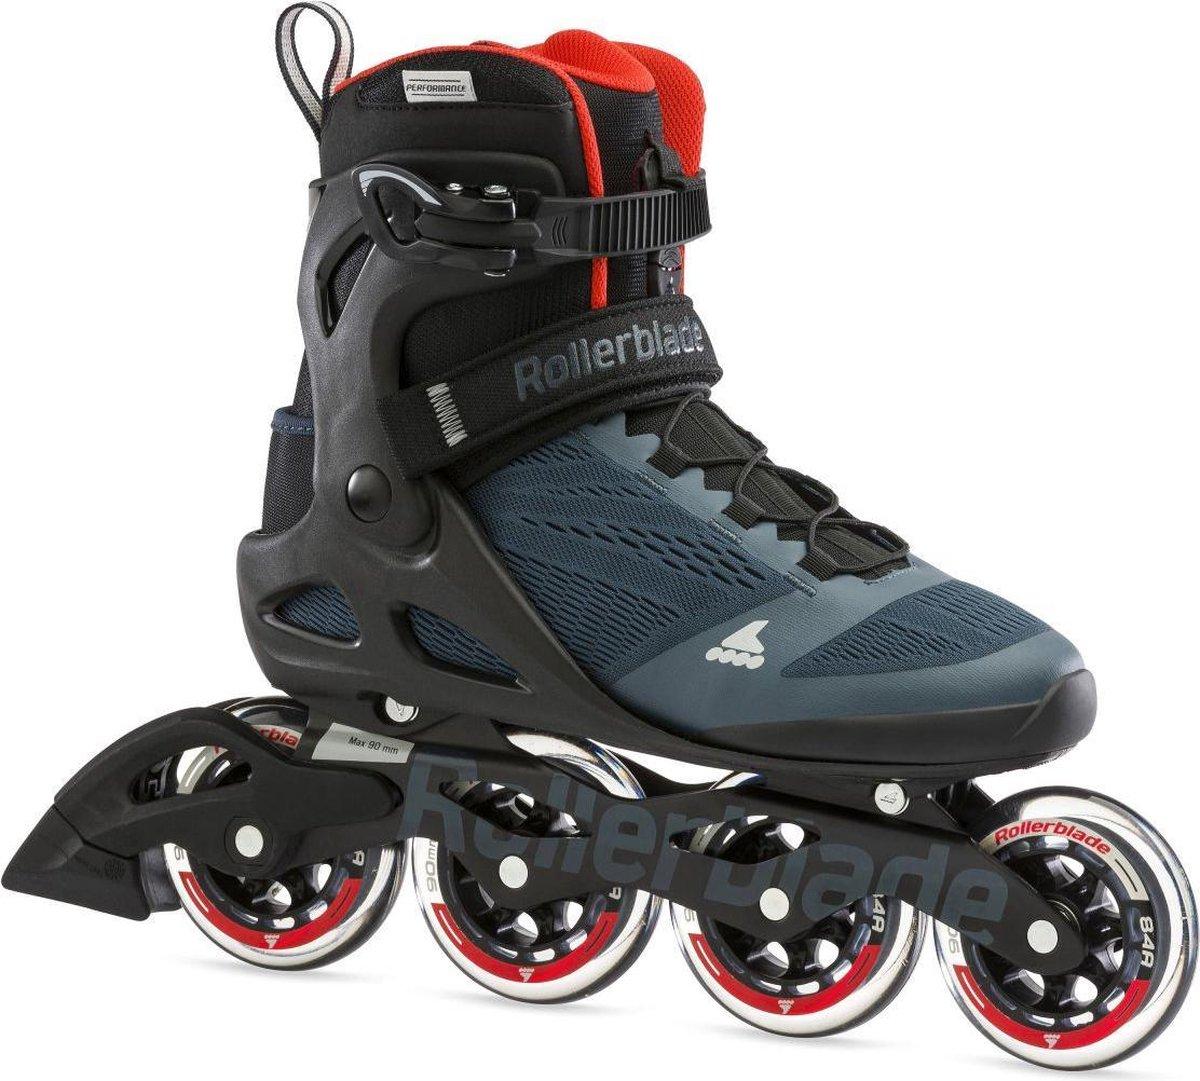 Rollerblade Macroblade inline skates 90 mm orion blue / spicy orange